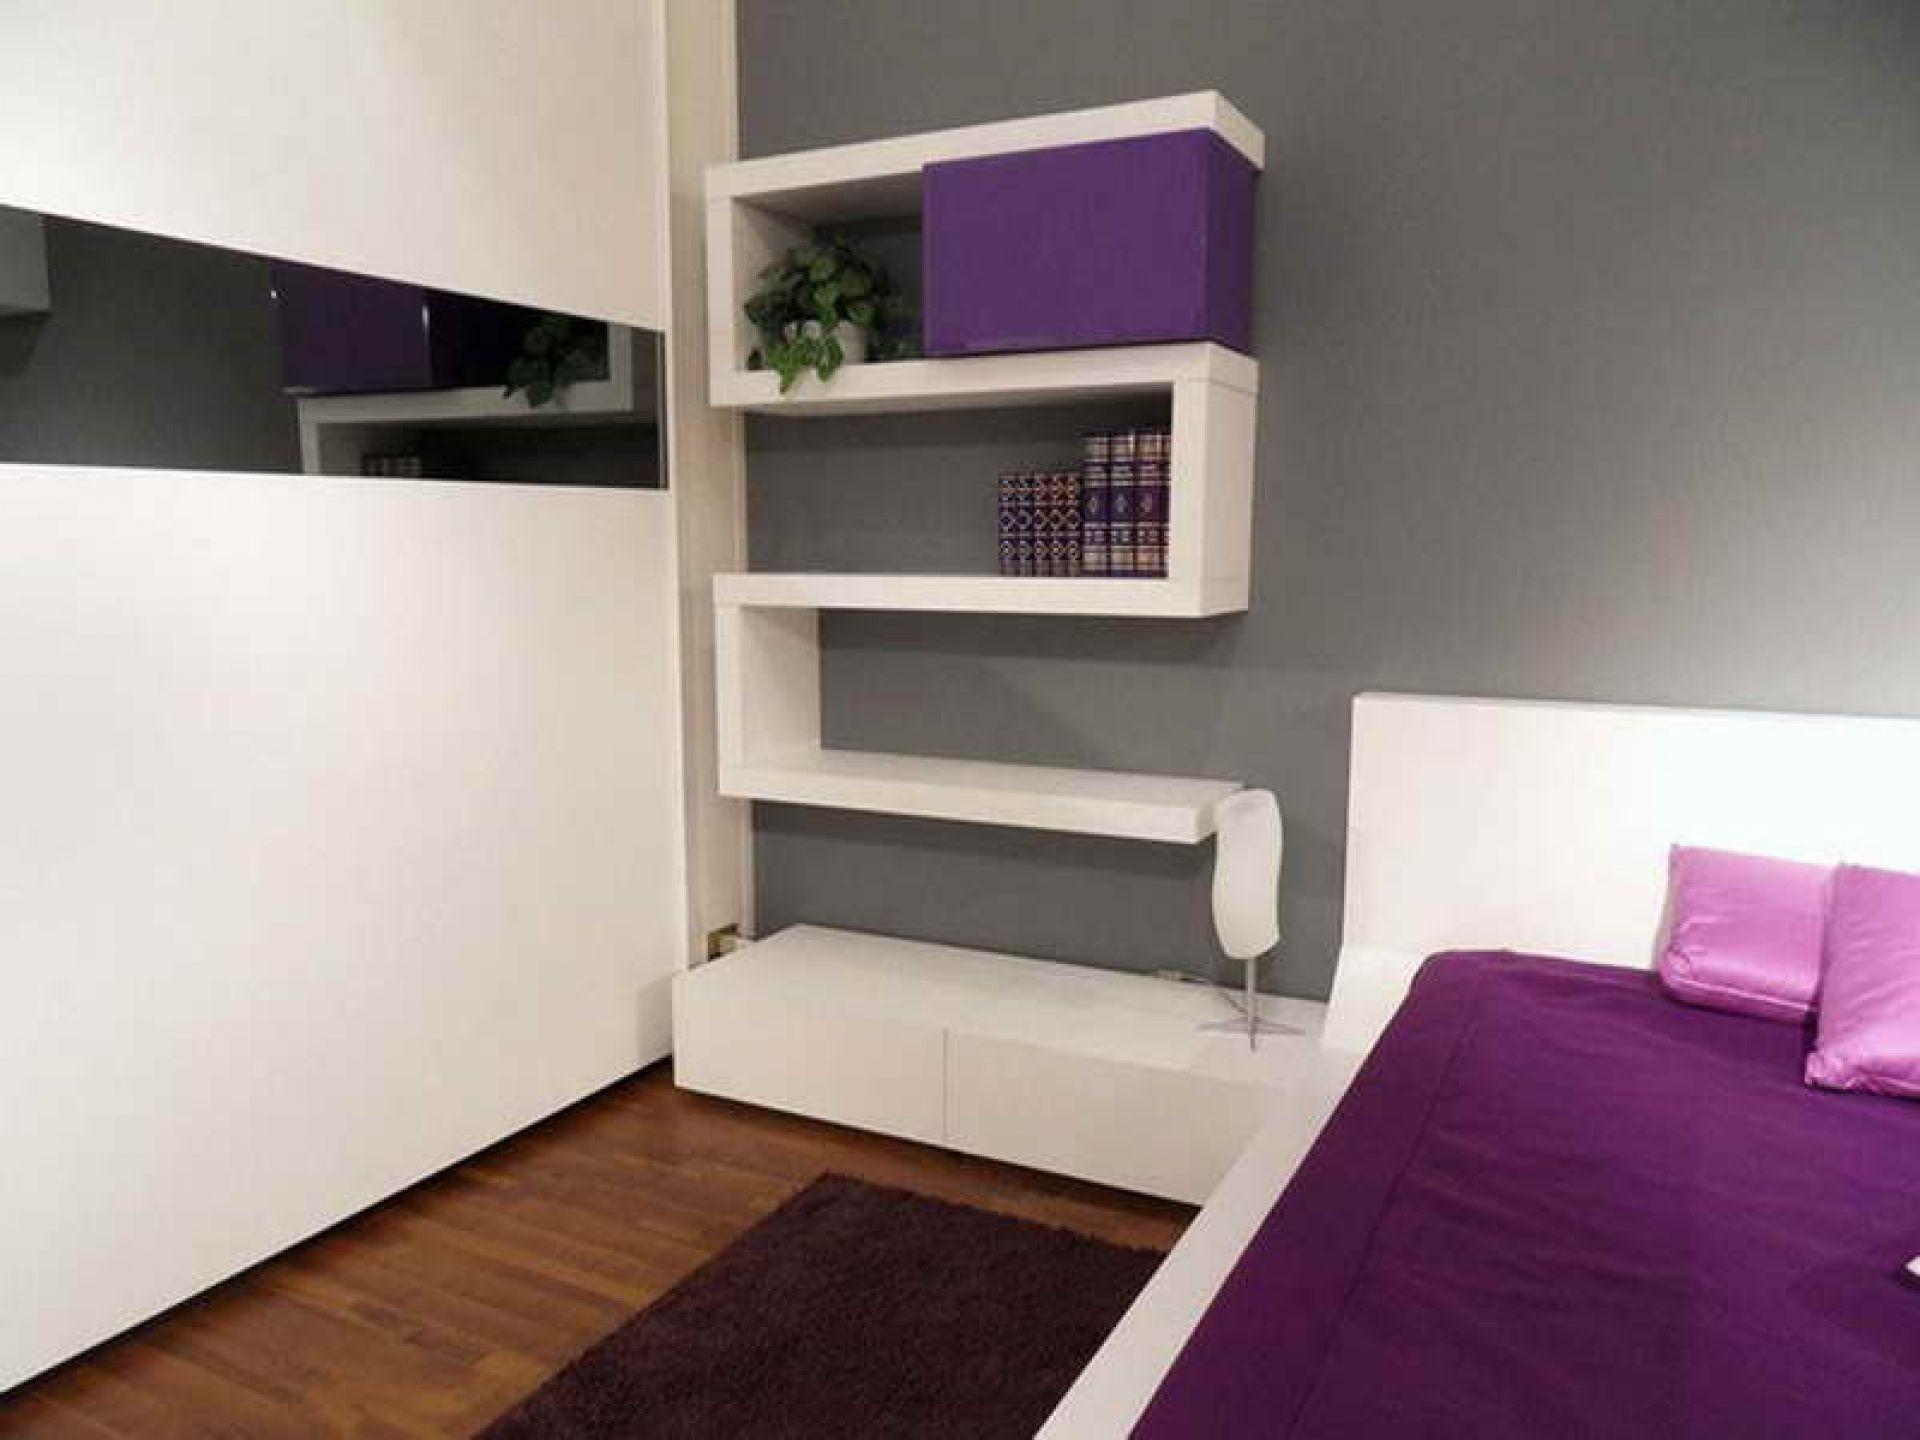 wonderful bedroom storage ideas creative purple kids design | Paint Ideas For Bedrooms Enchanting Teen With 3 Shelves ...